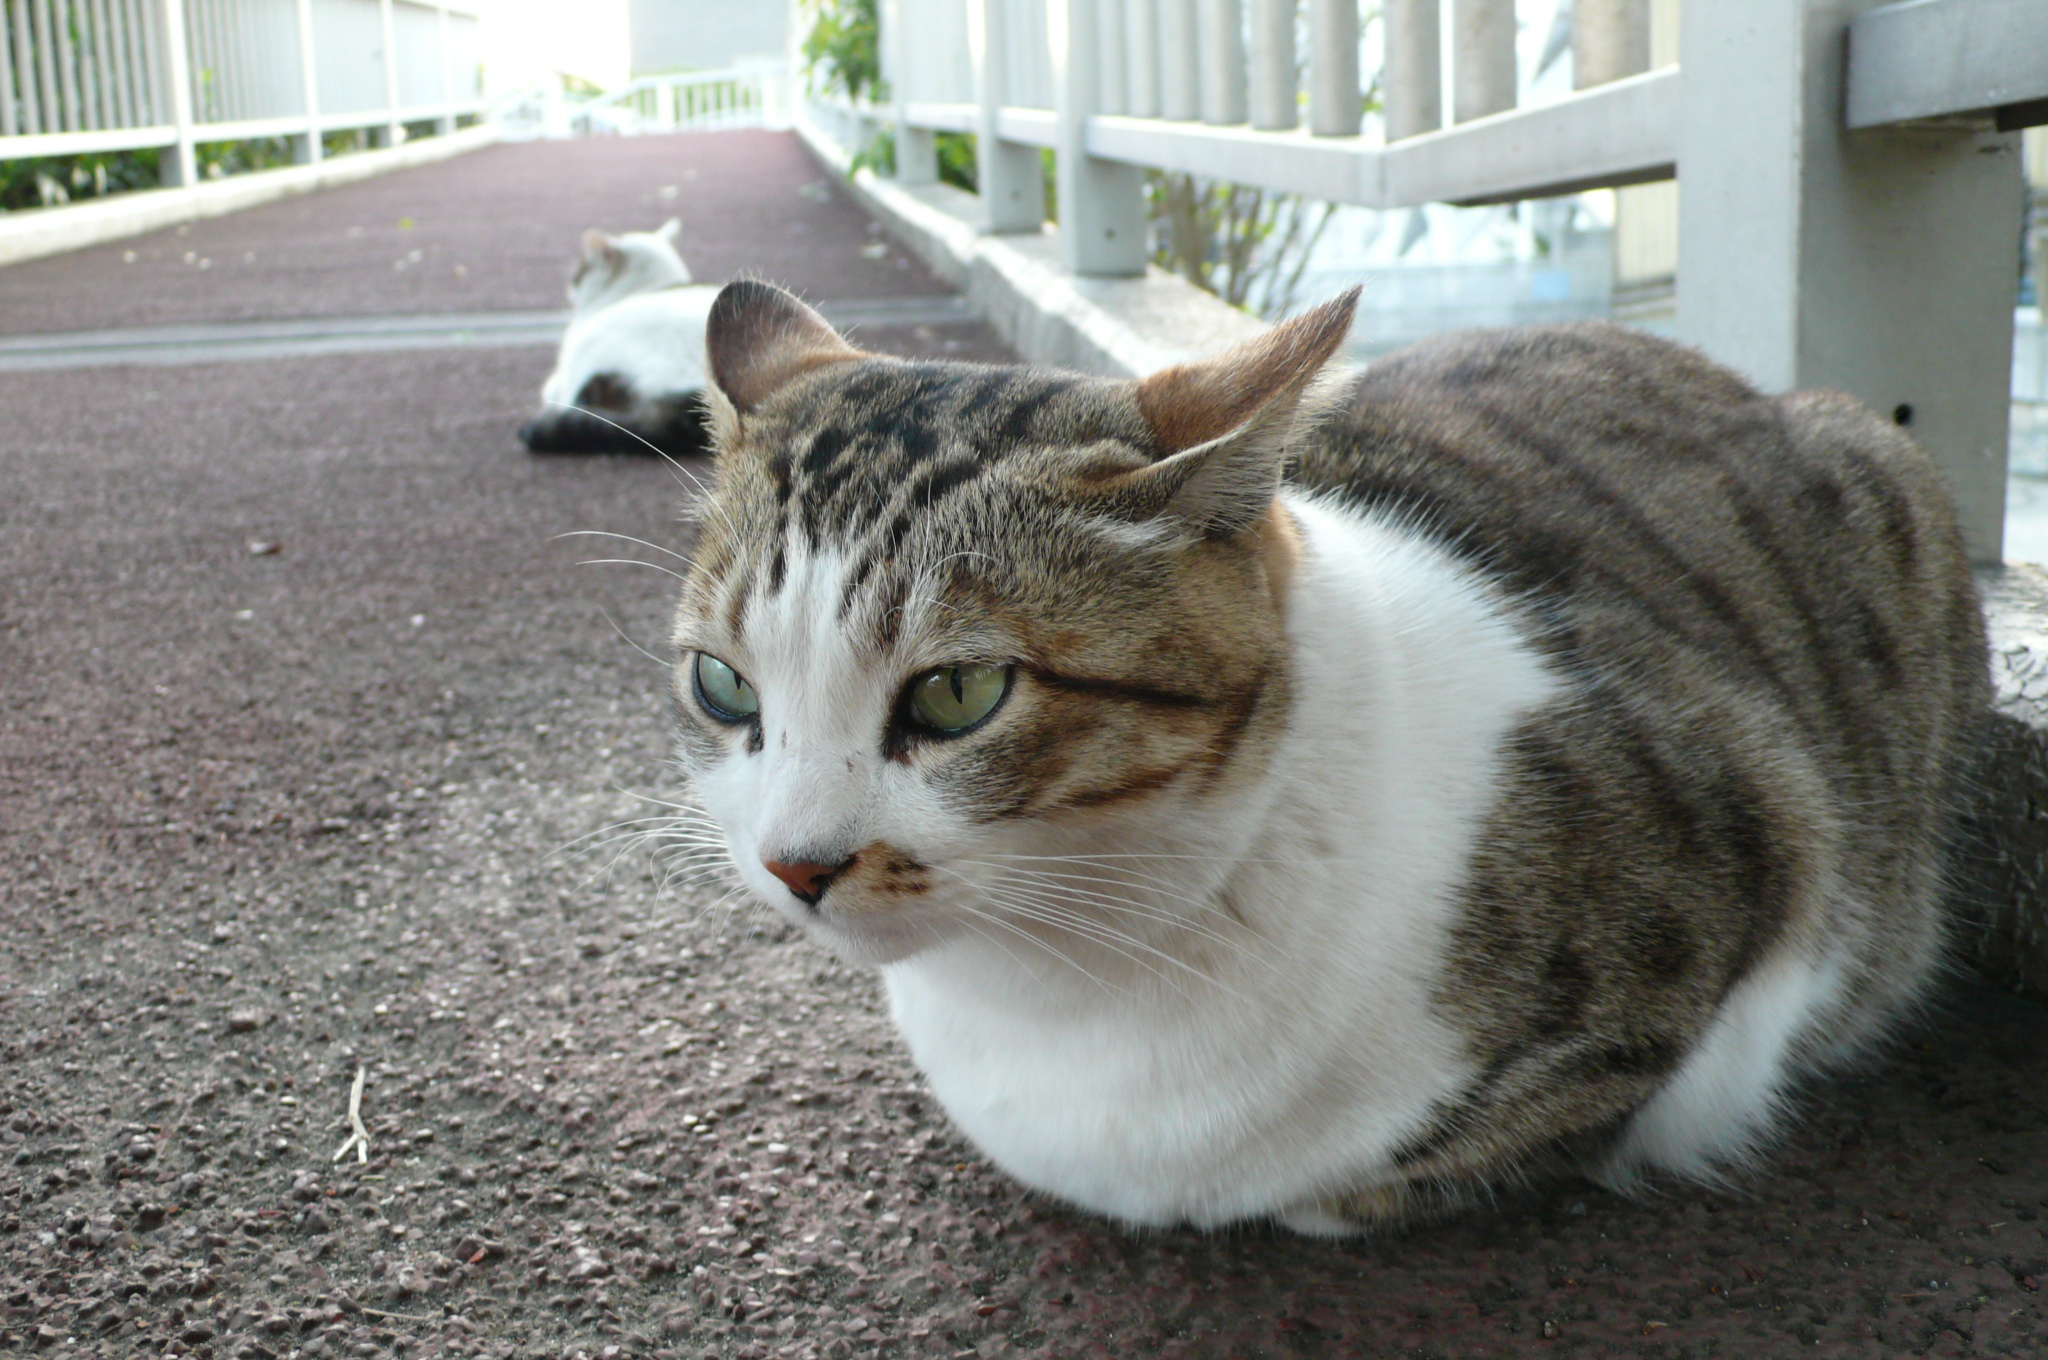 Does Good Cat Food Make Their Fur Soft